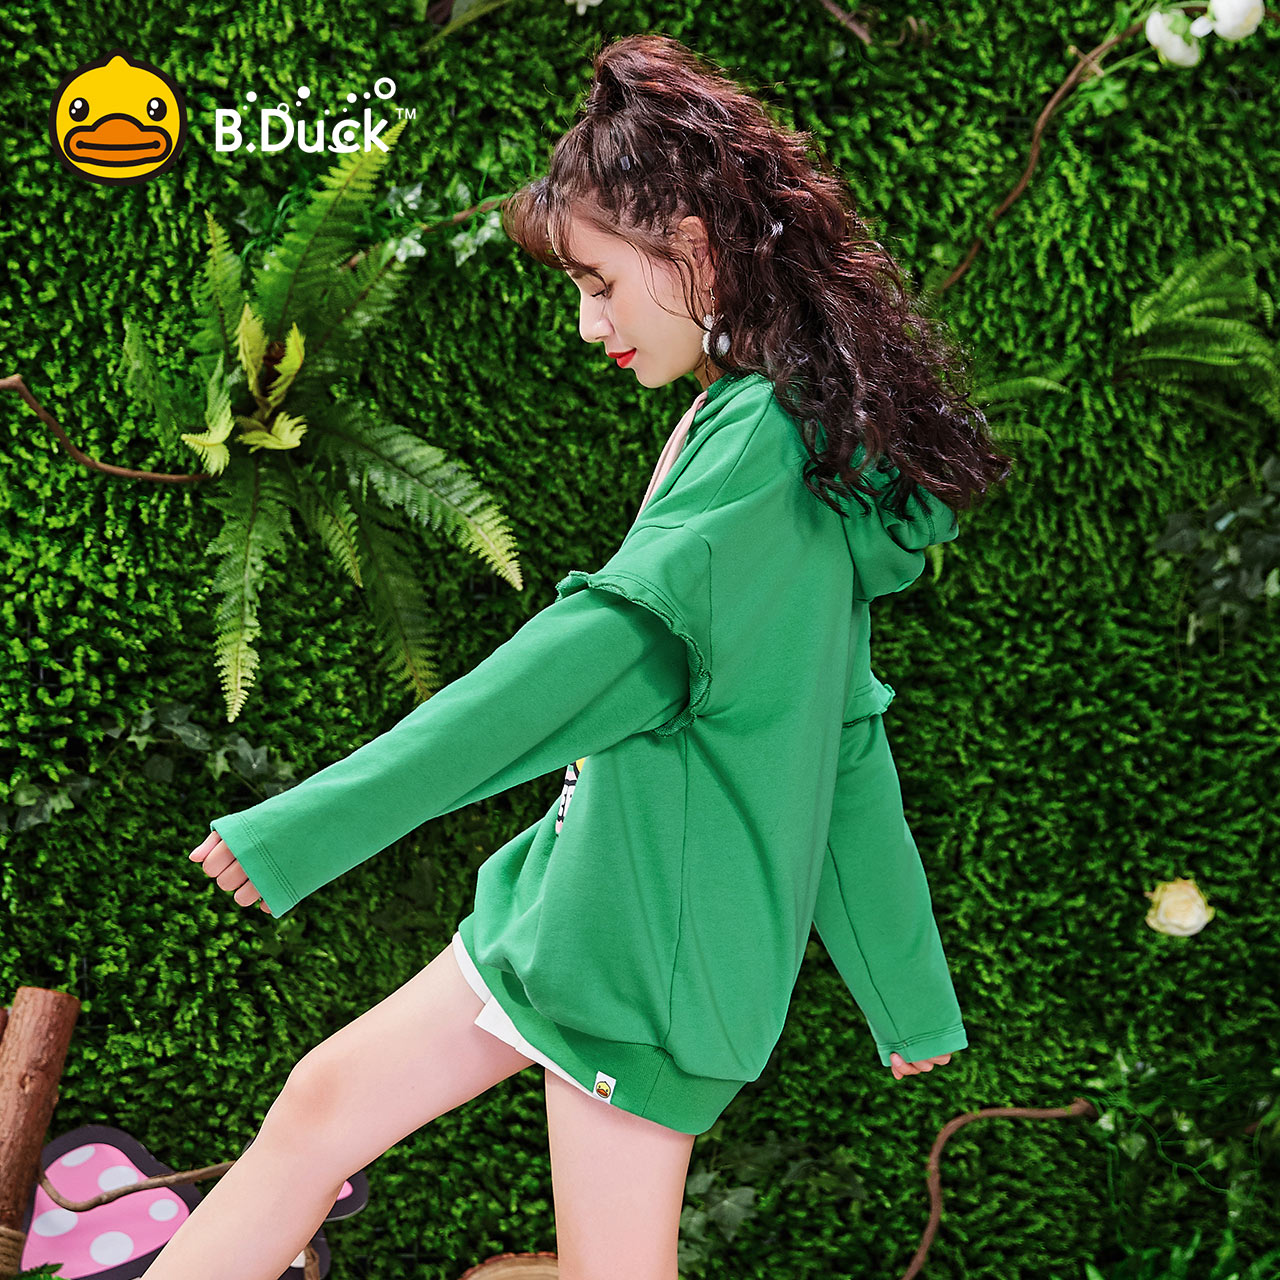 BDuck小黄鸭卫衣女2018秋装新款韩版宽松ins超火木耳边长袖假两件